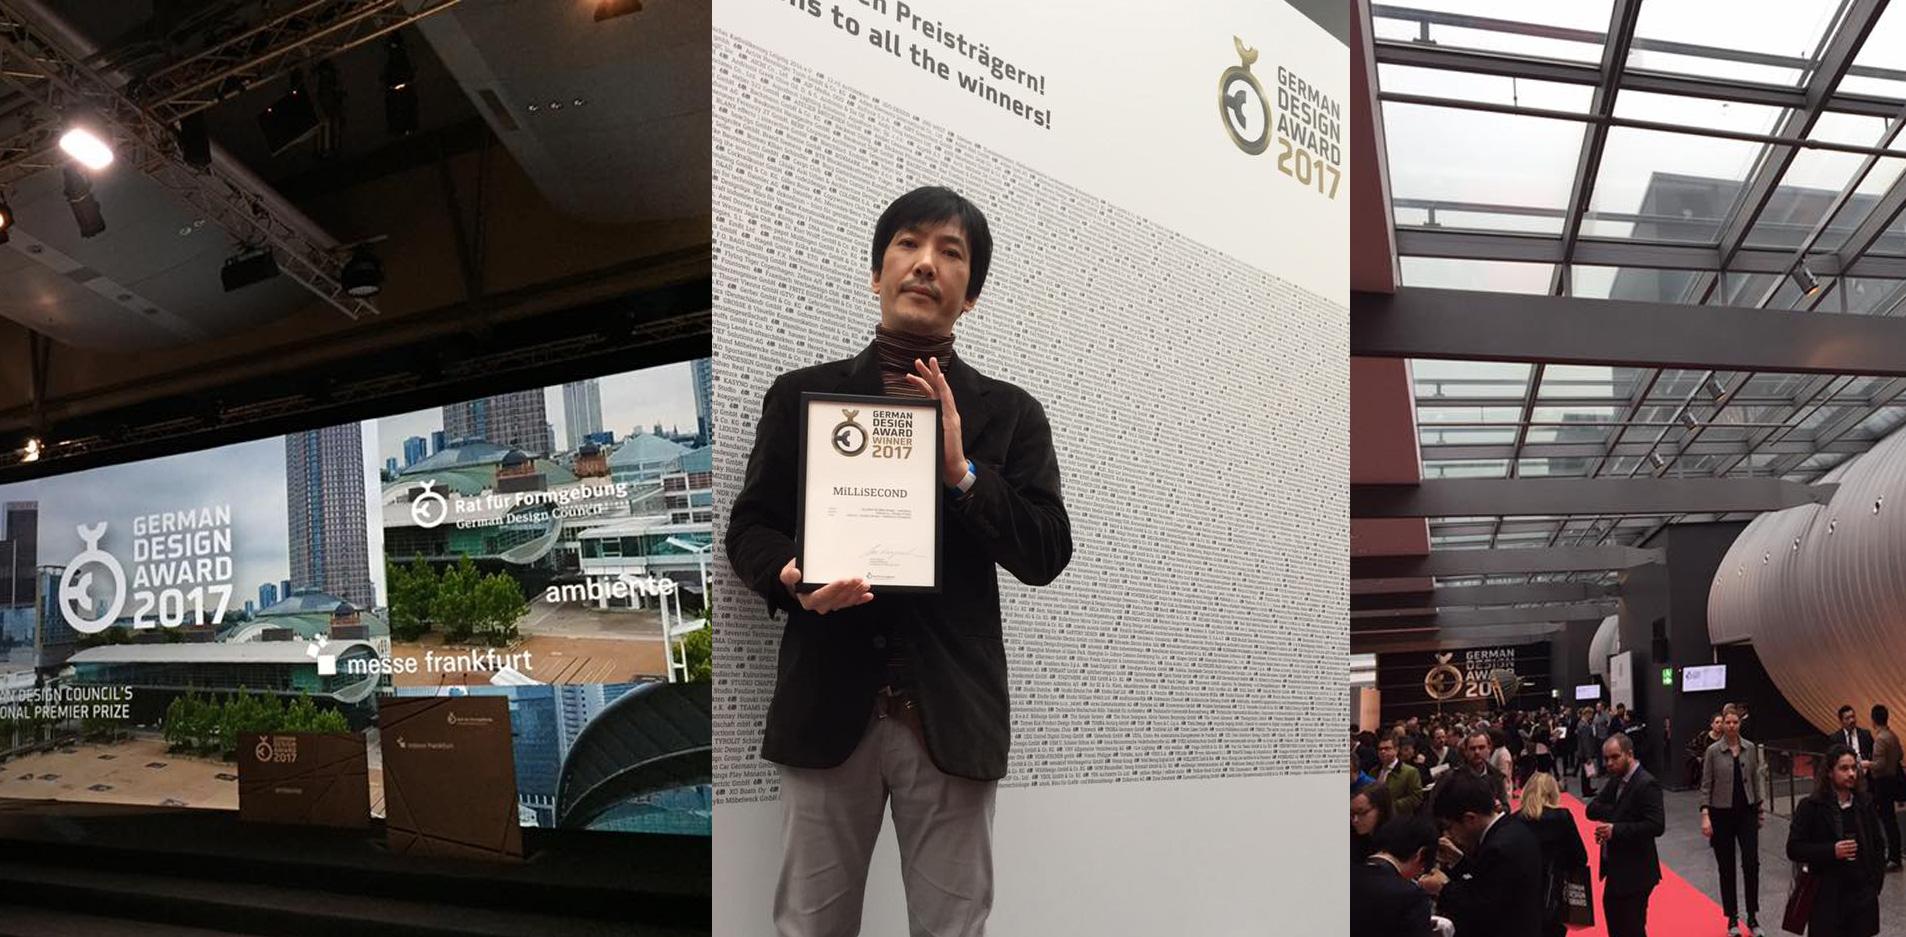 German Design Award ceremony